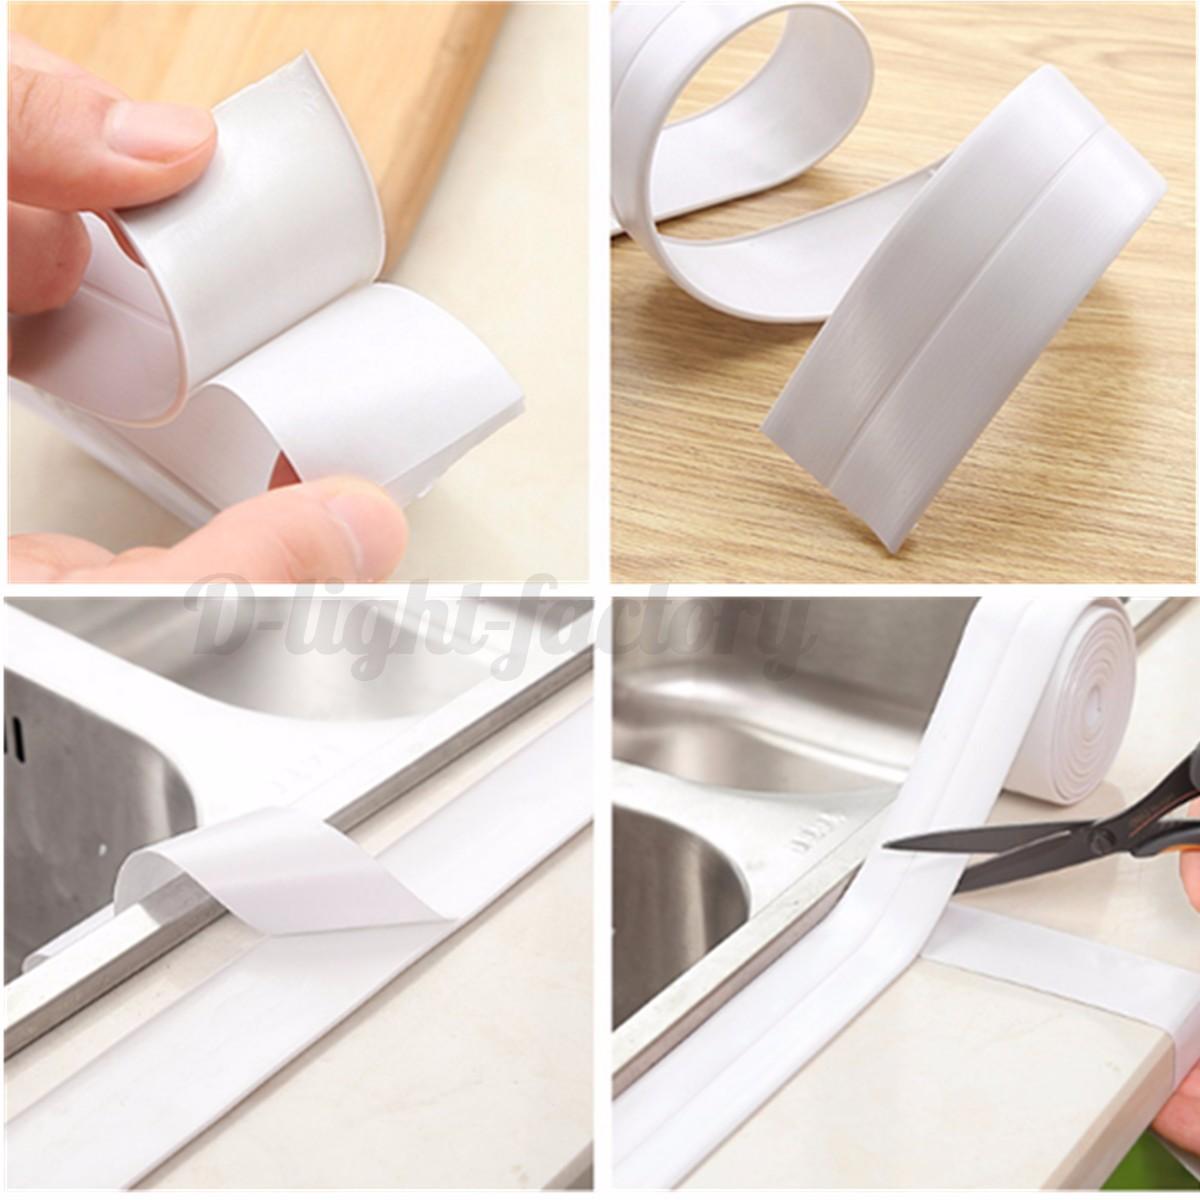 X 22mm bath kitchen wall sealing strip sealant tape sink basin edge trim ebay for Best sealant for bathroom sink